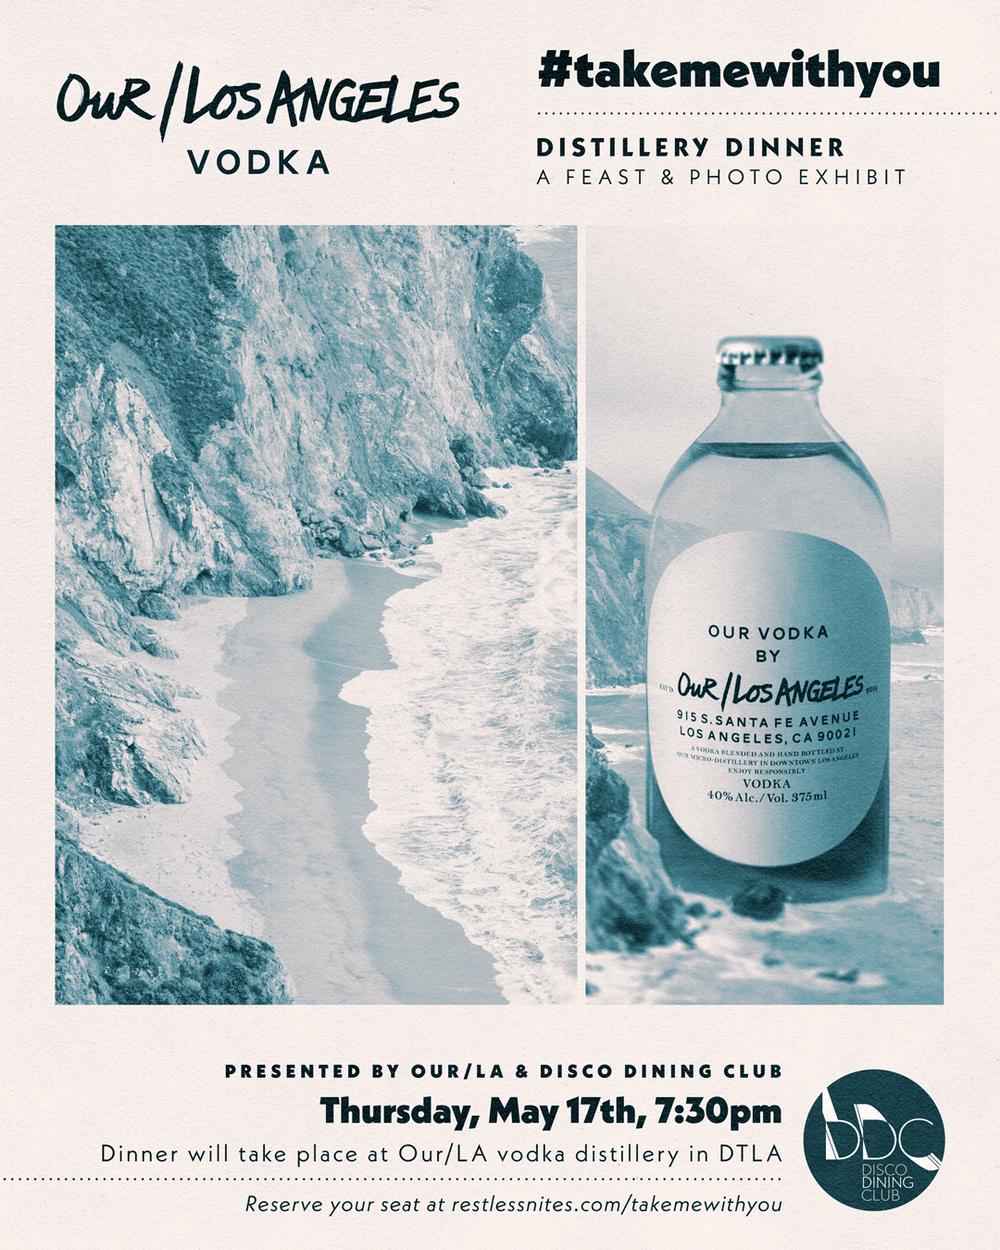 Distillery Dinner Poster 2.png